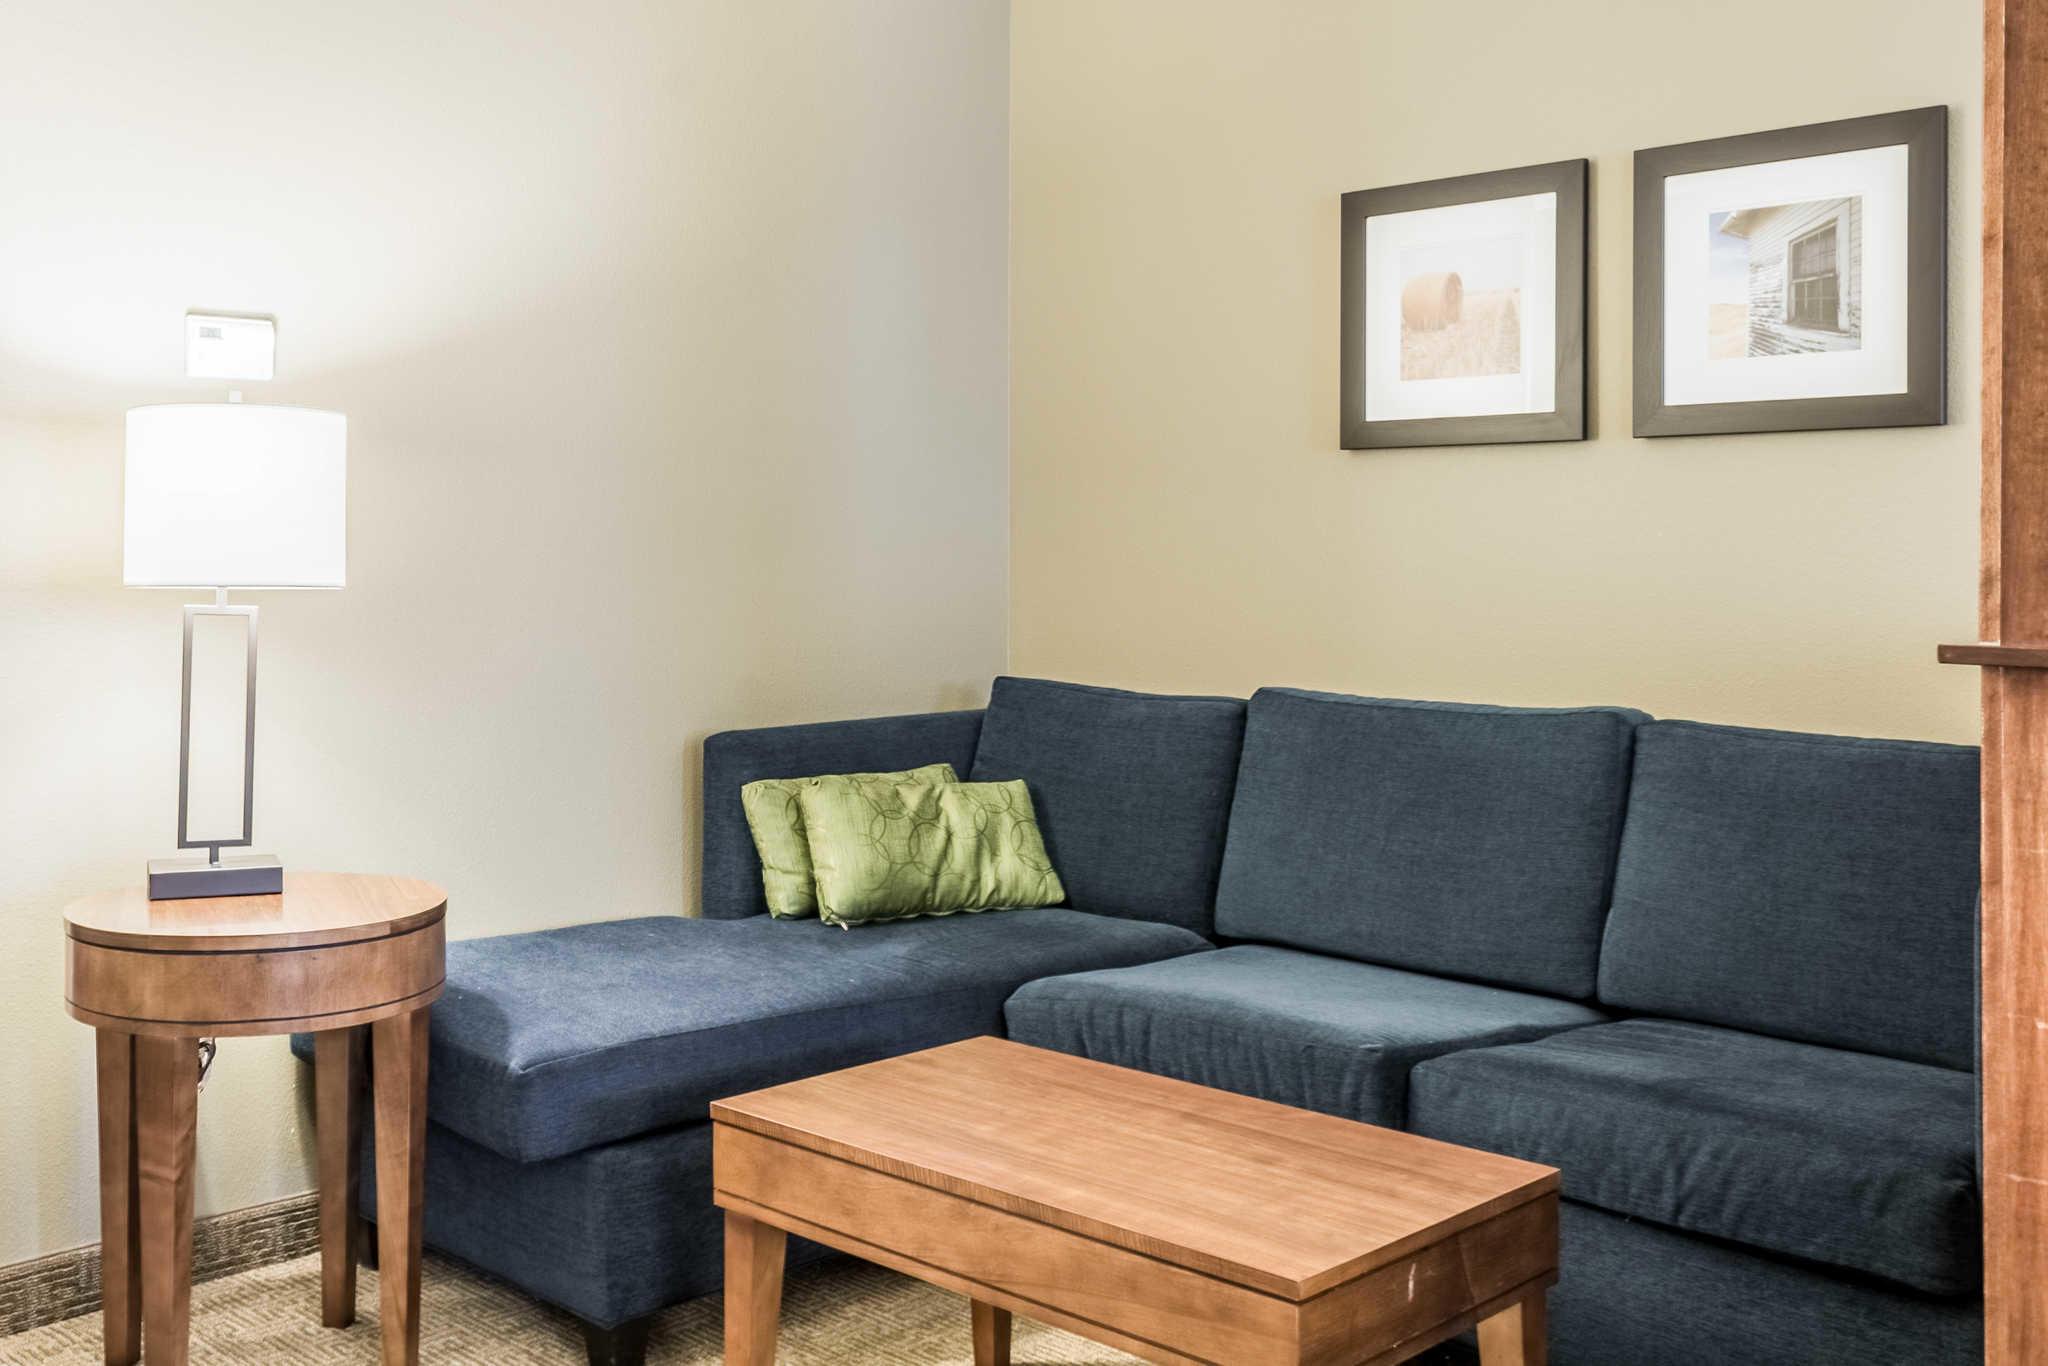 Comfort Inn & Suites image 12